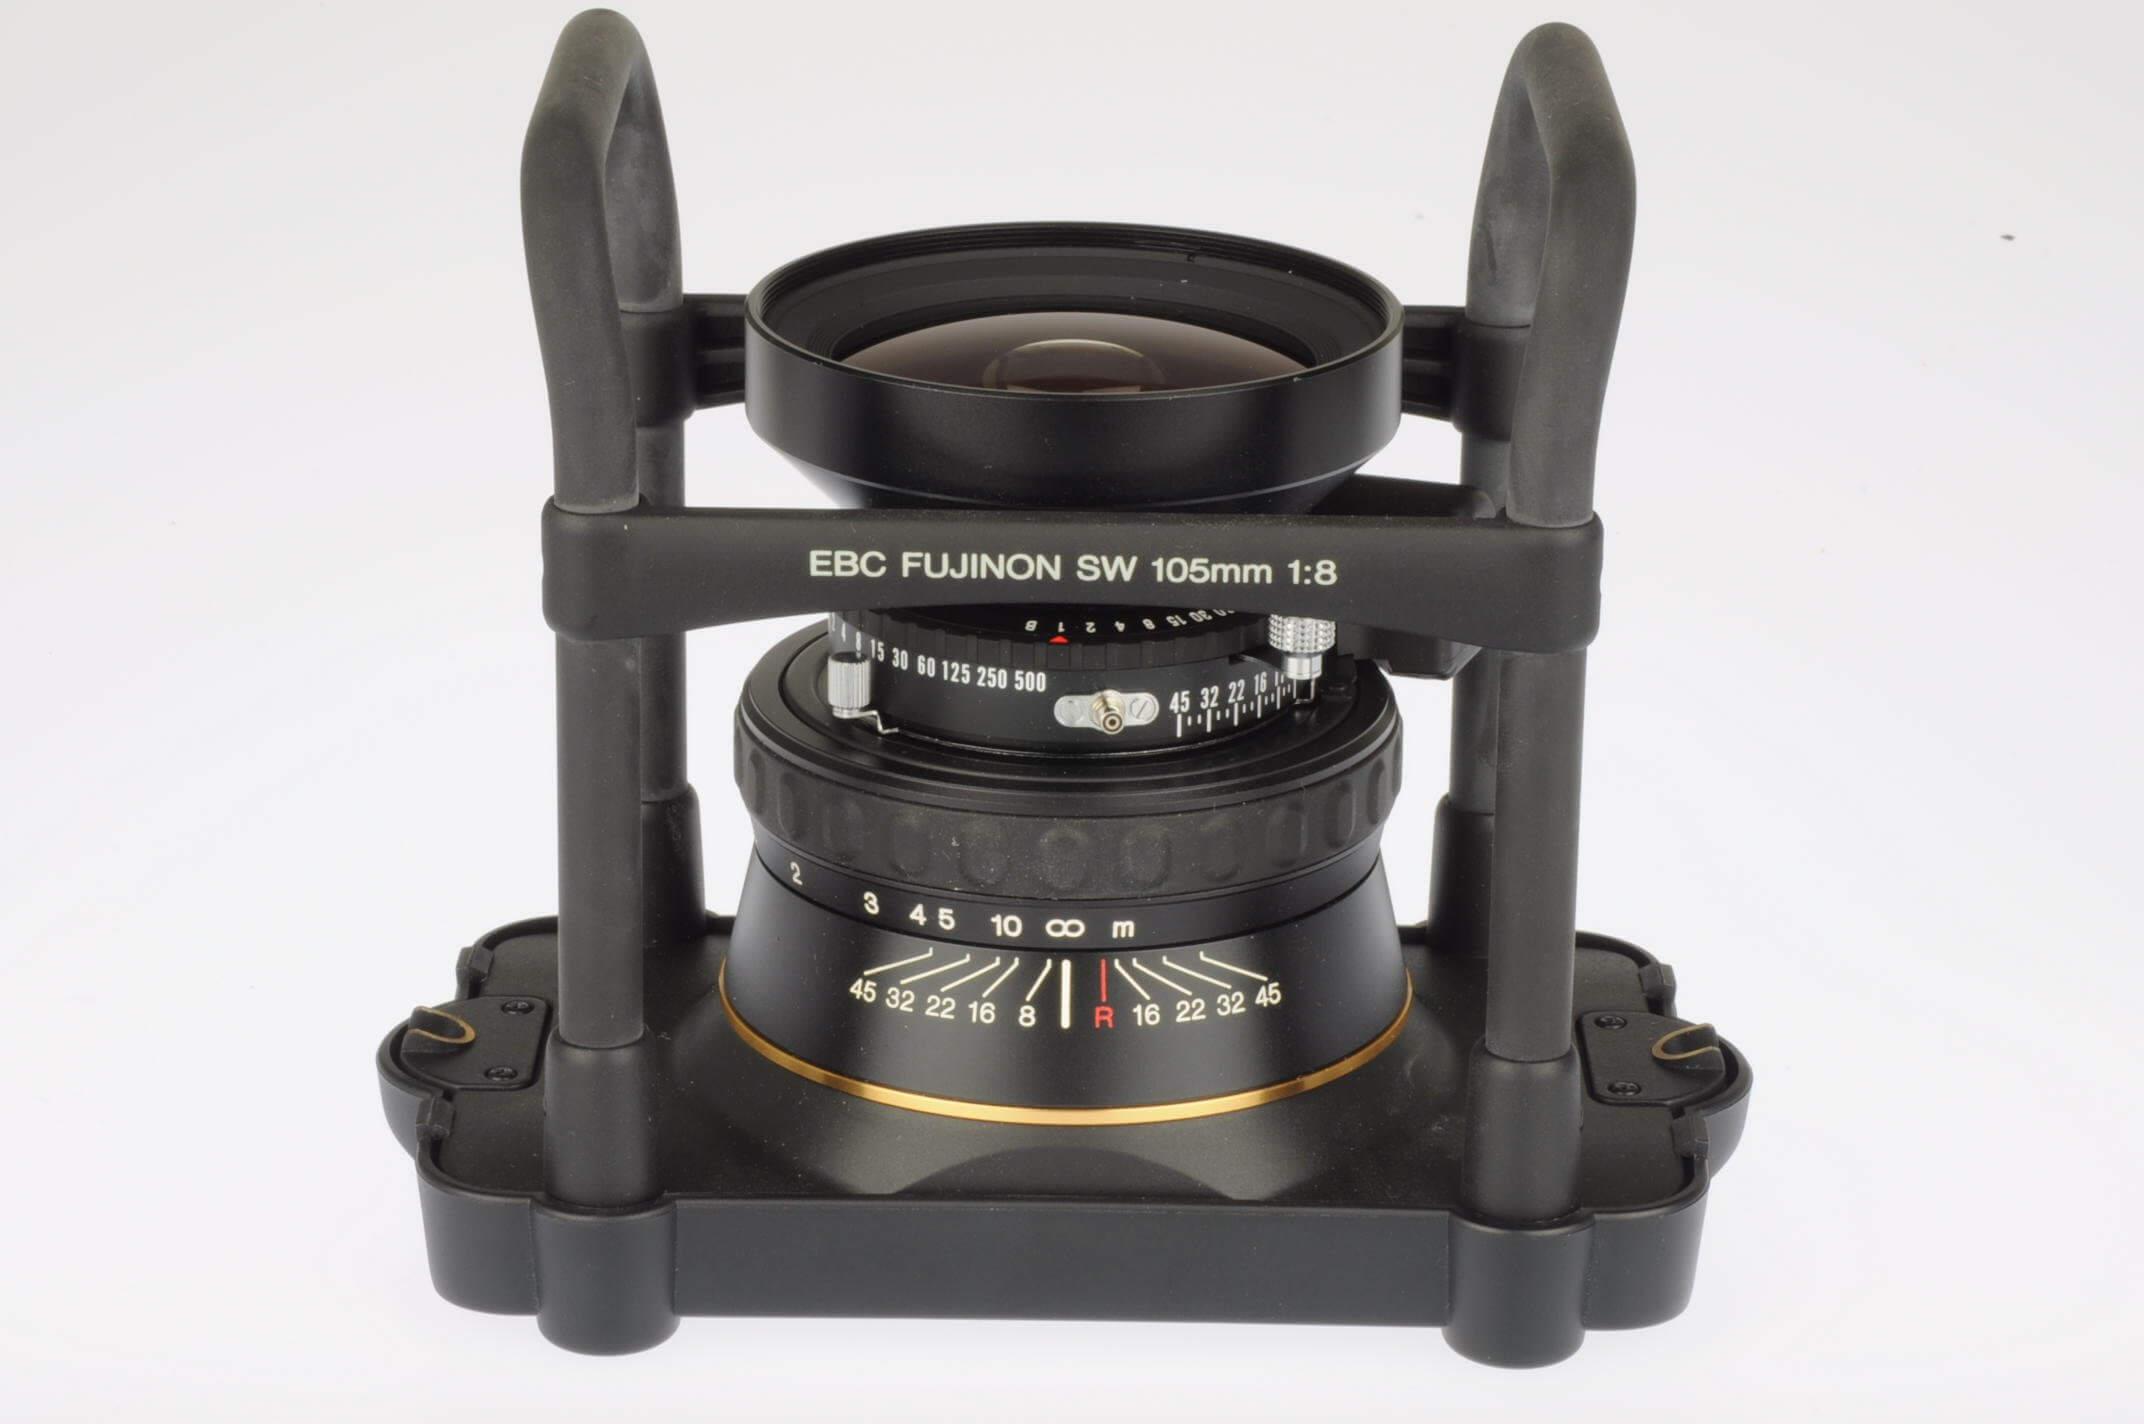 Fuji 105 f8 EBC SW for GX617, totally mint!